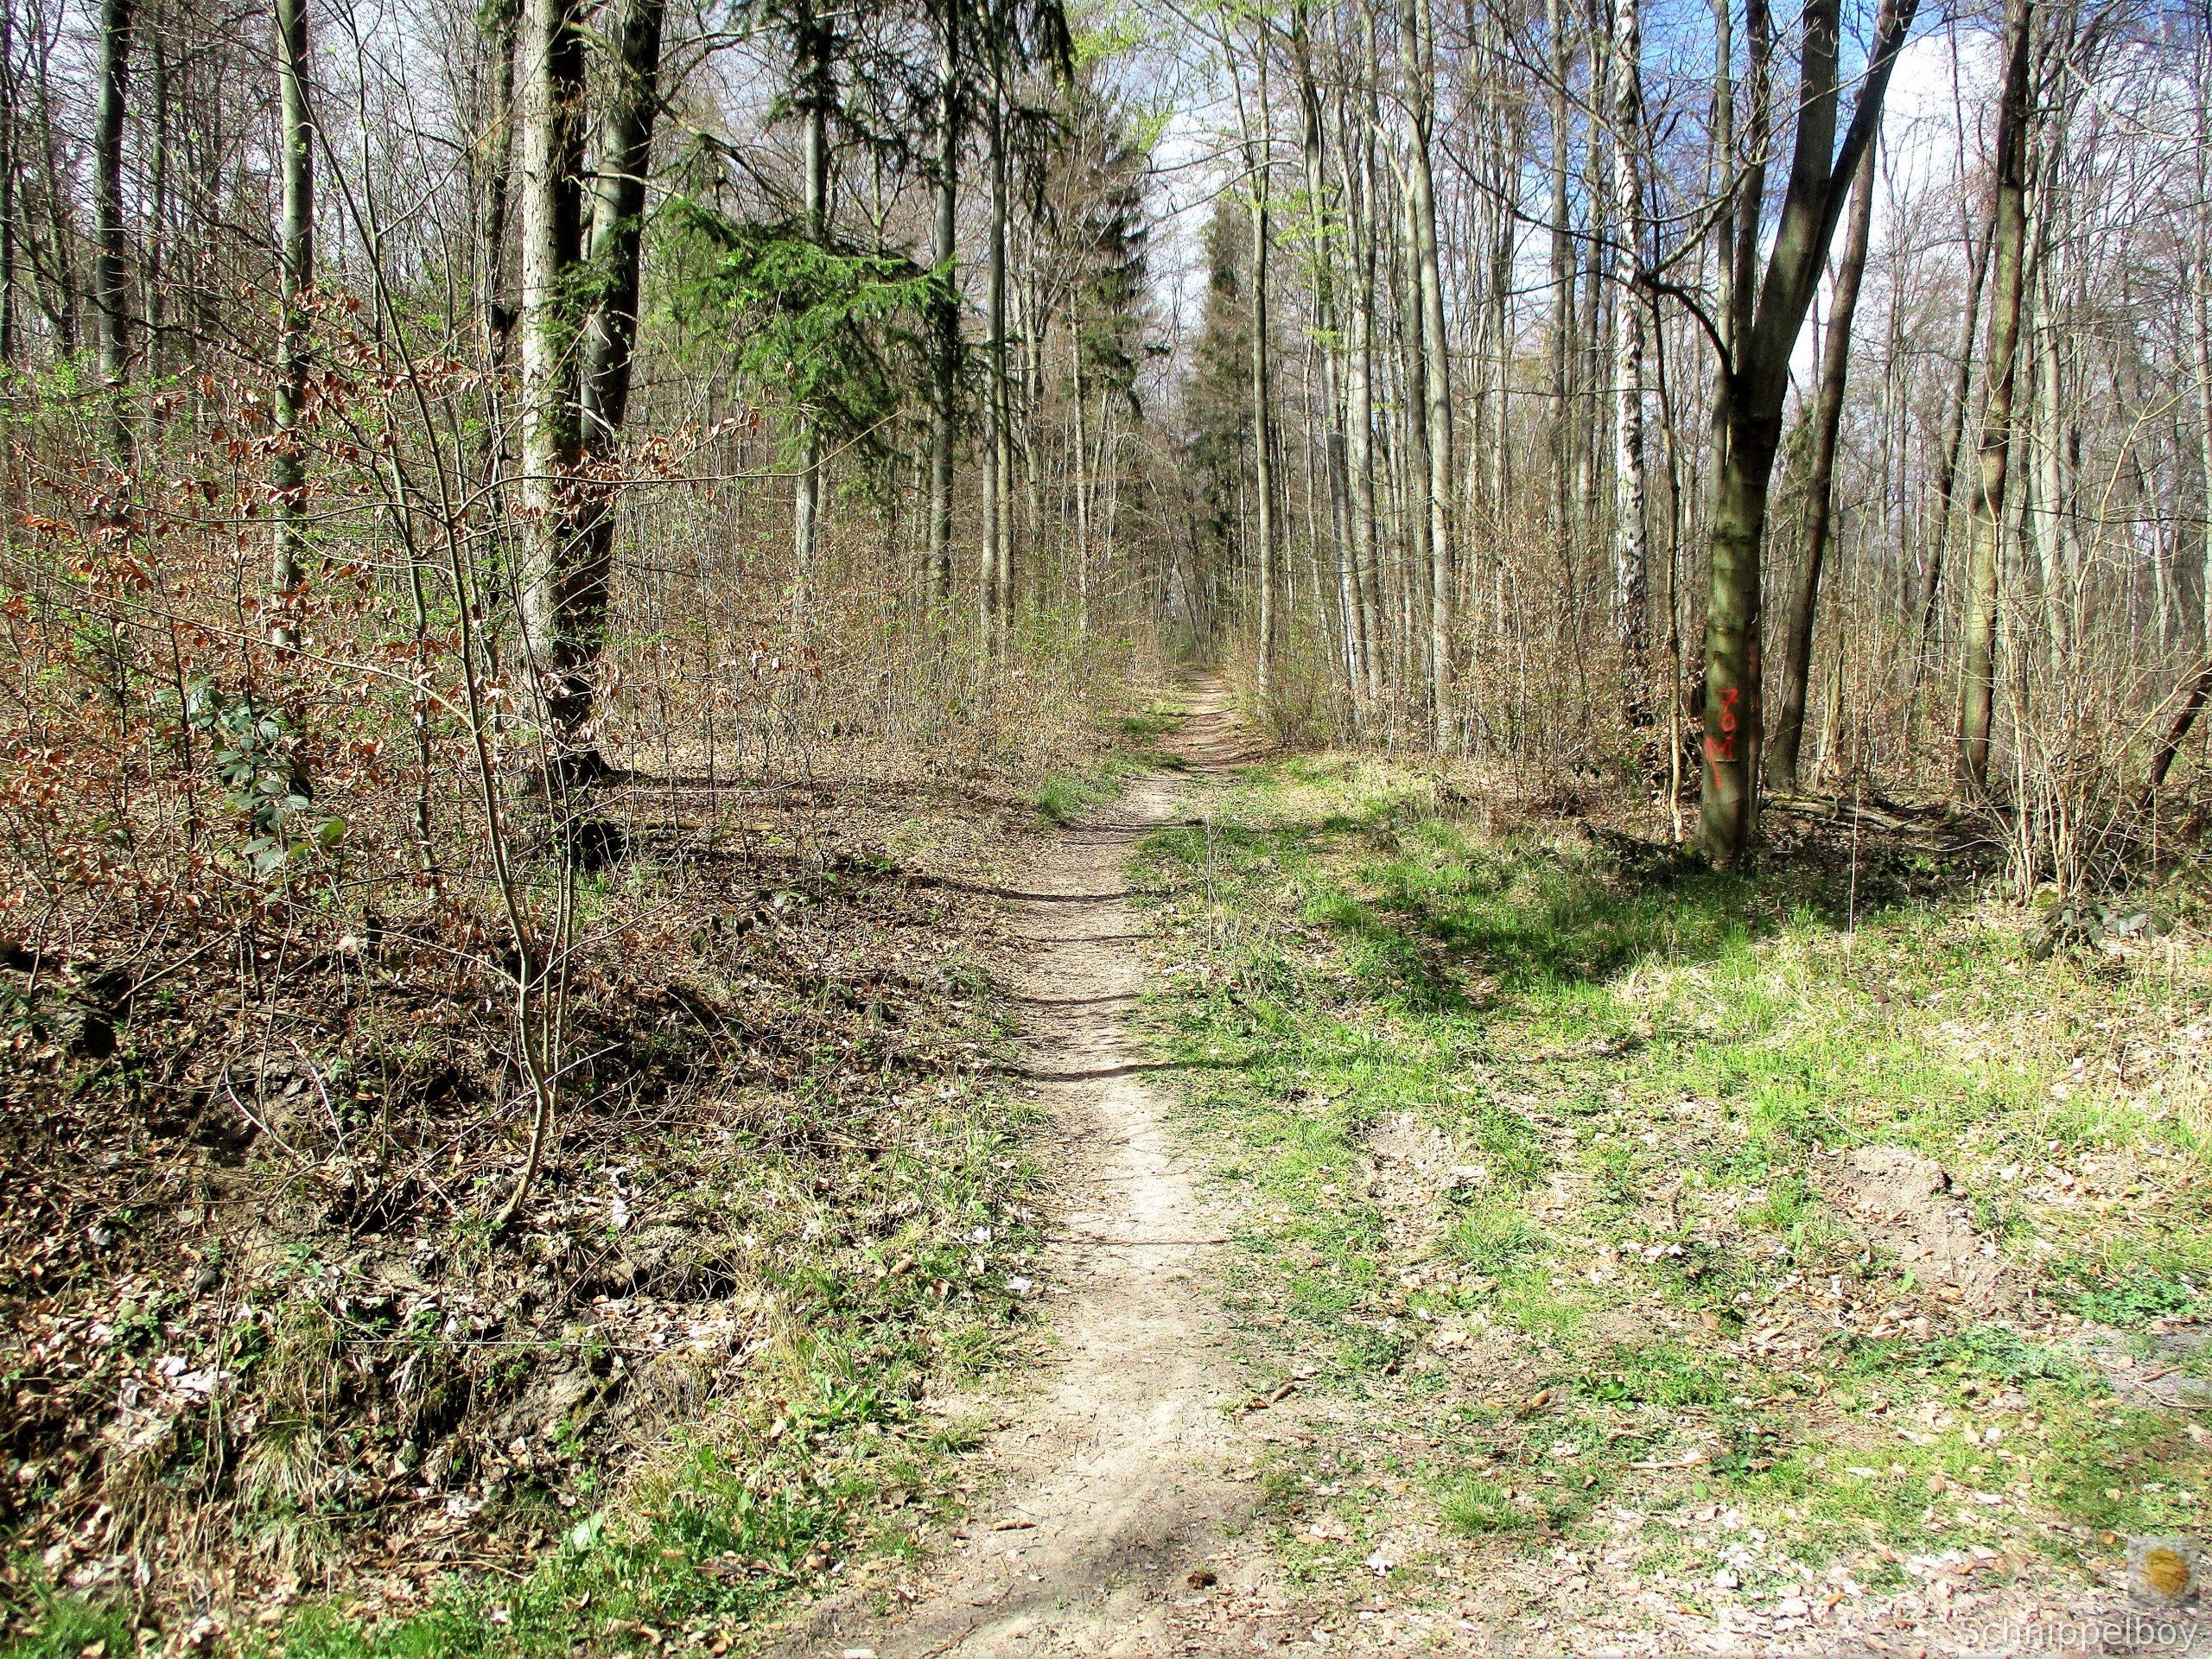 Spaziergang in aller Frühe (9)